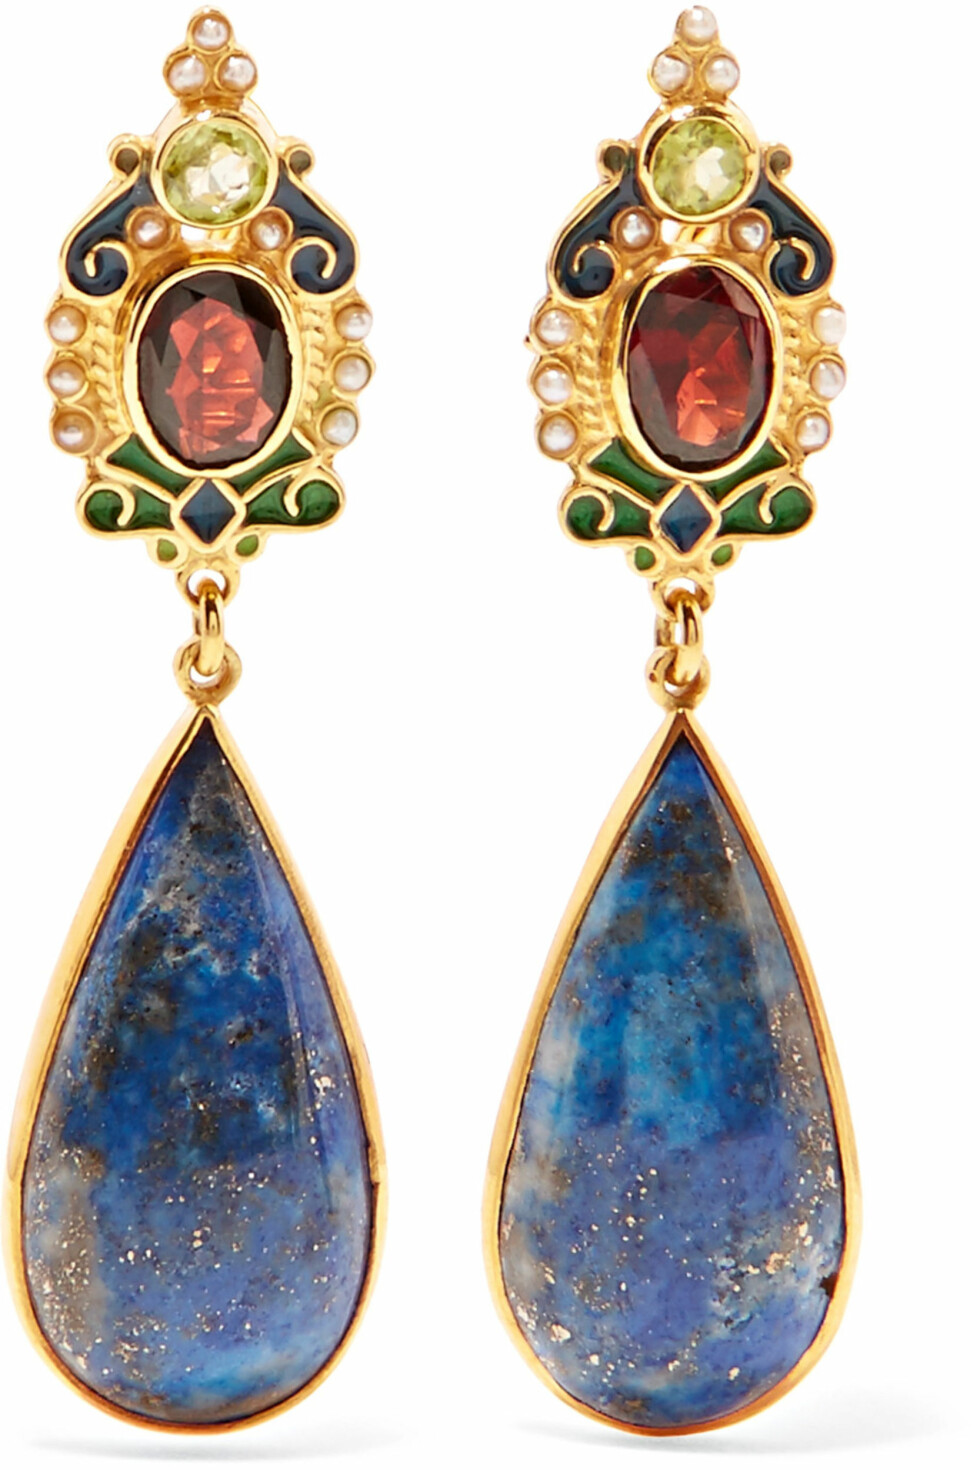 Øredobber fra Percossi Papi via Net-a-poter.com |4444,-| https://www.net-a-porter.com/no/en/product/1000097/percossi_papi/gold-plated--enamel-and-multi-stone-earrings